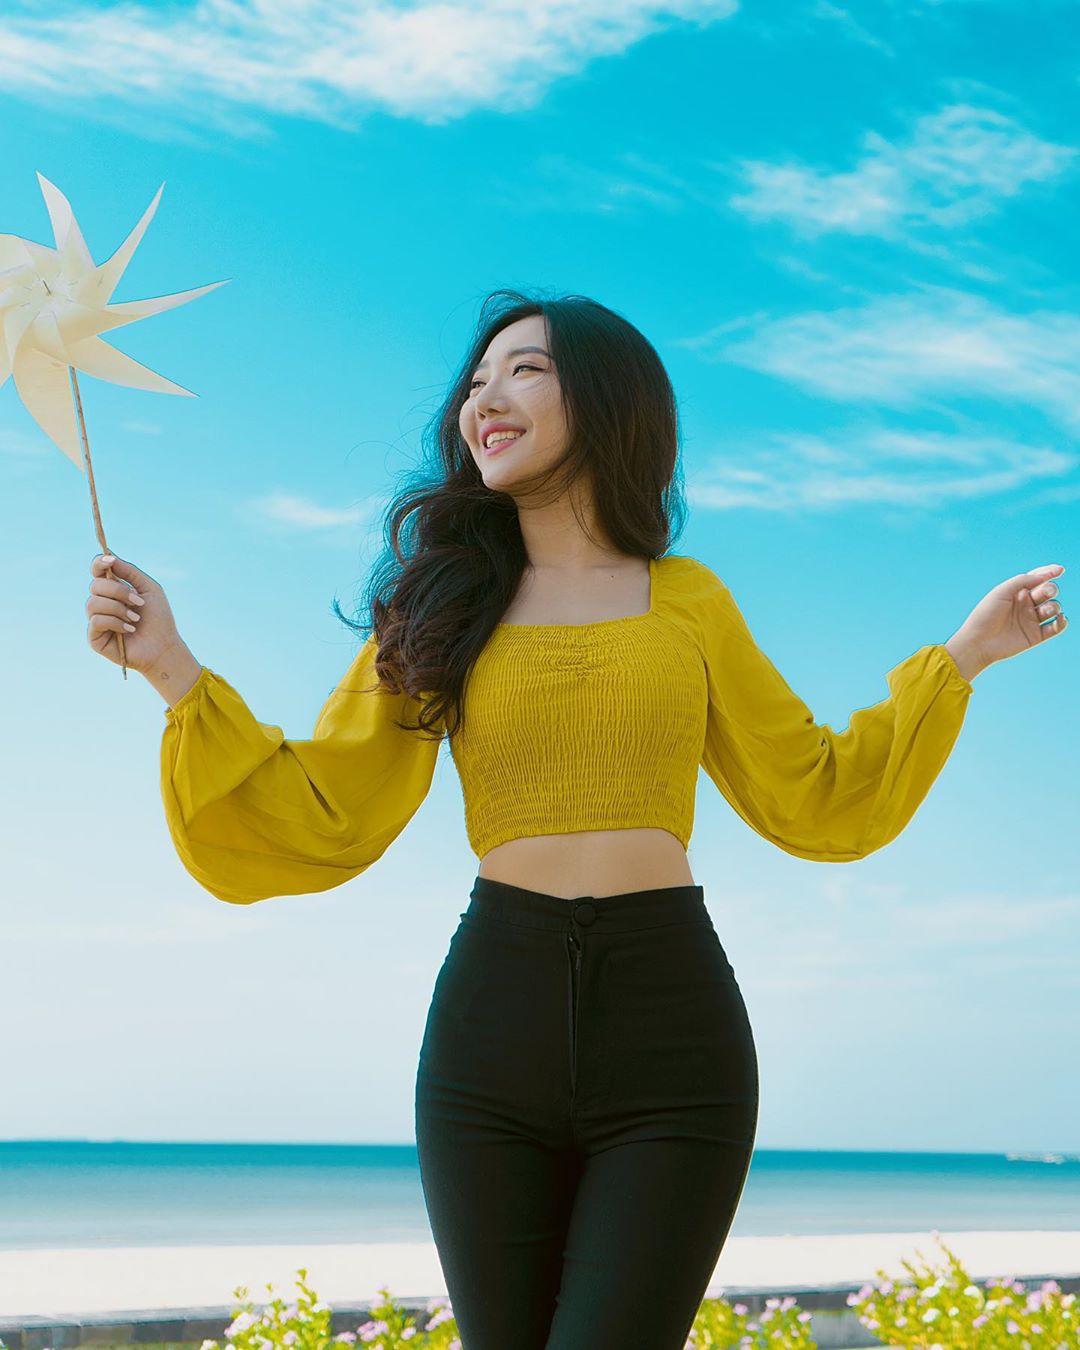 Hsu Eaint San, people in nature, yellow, smile